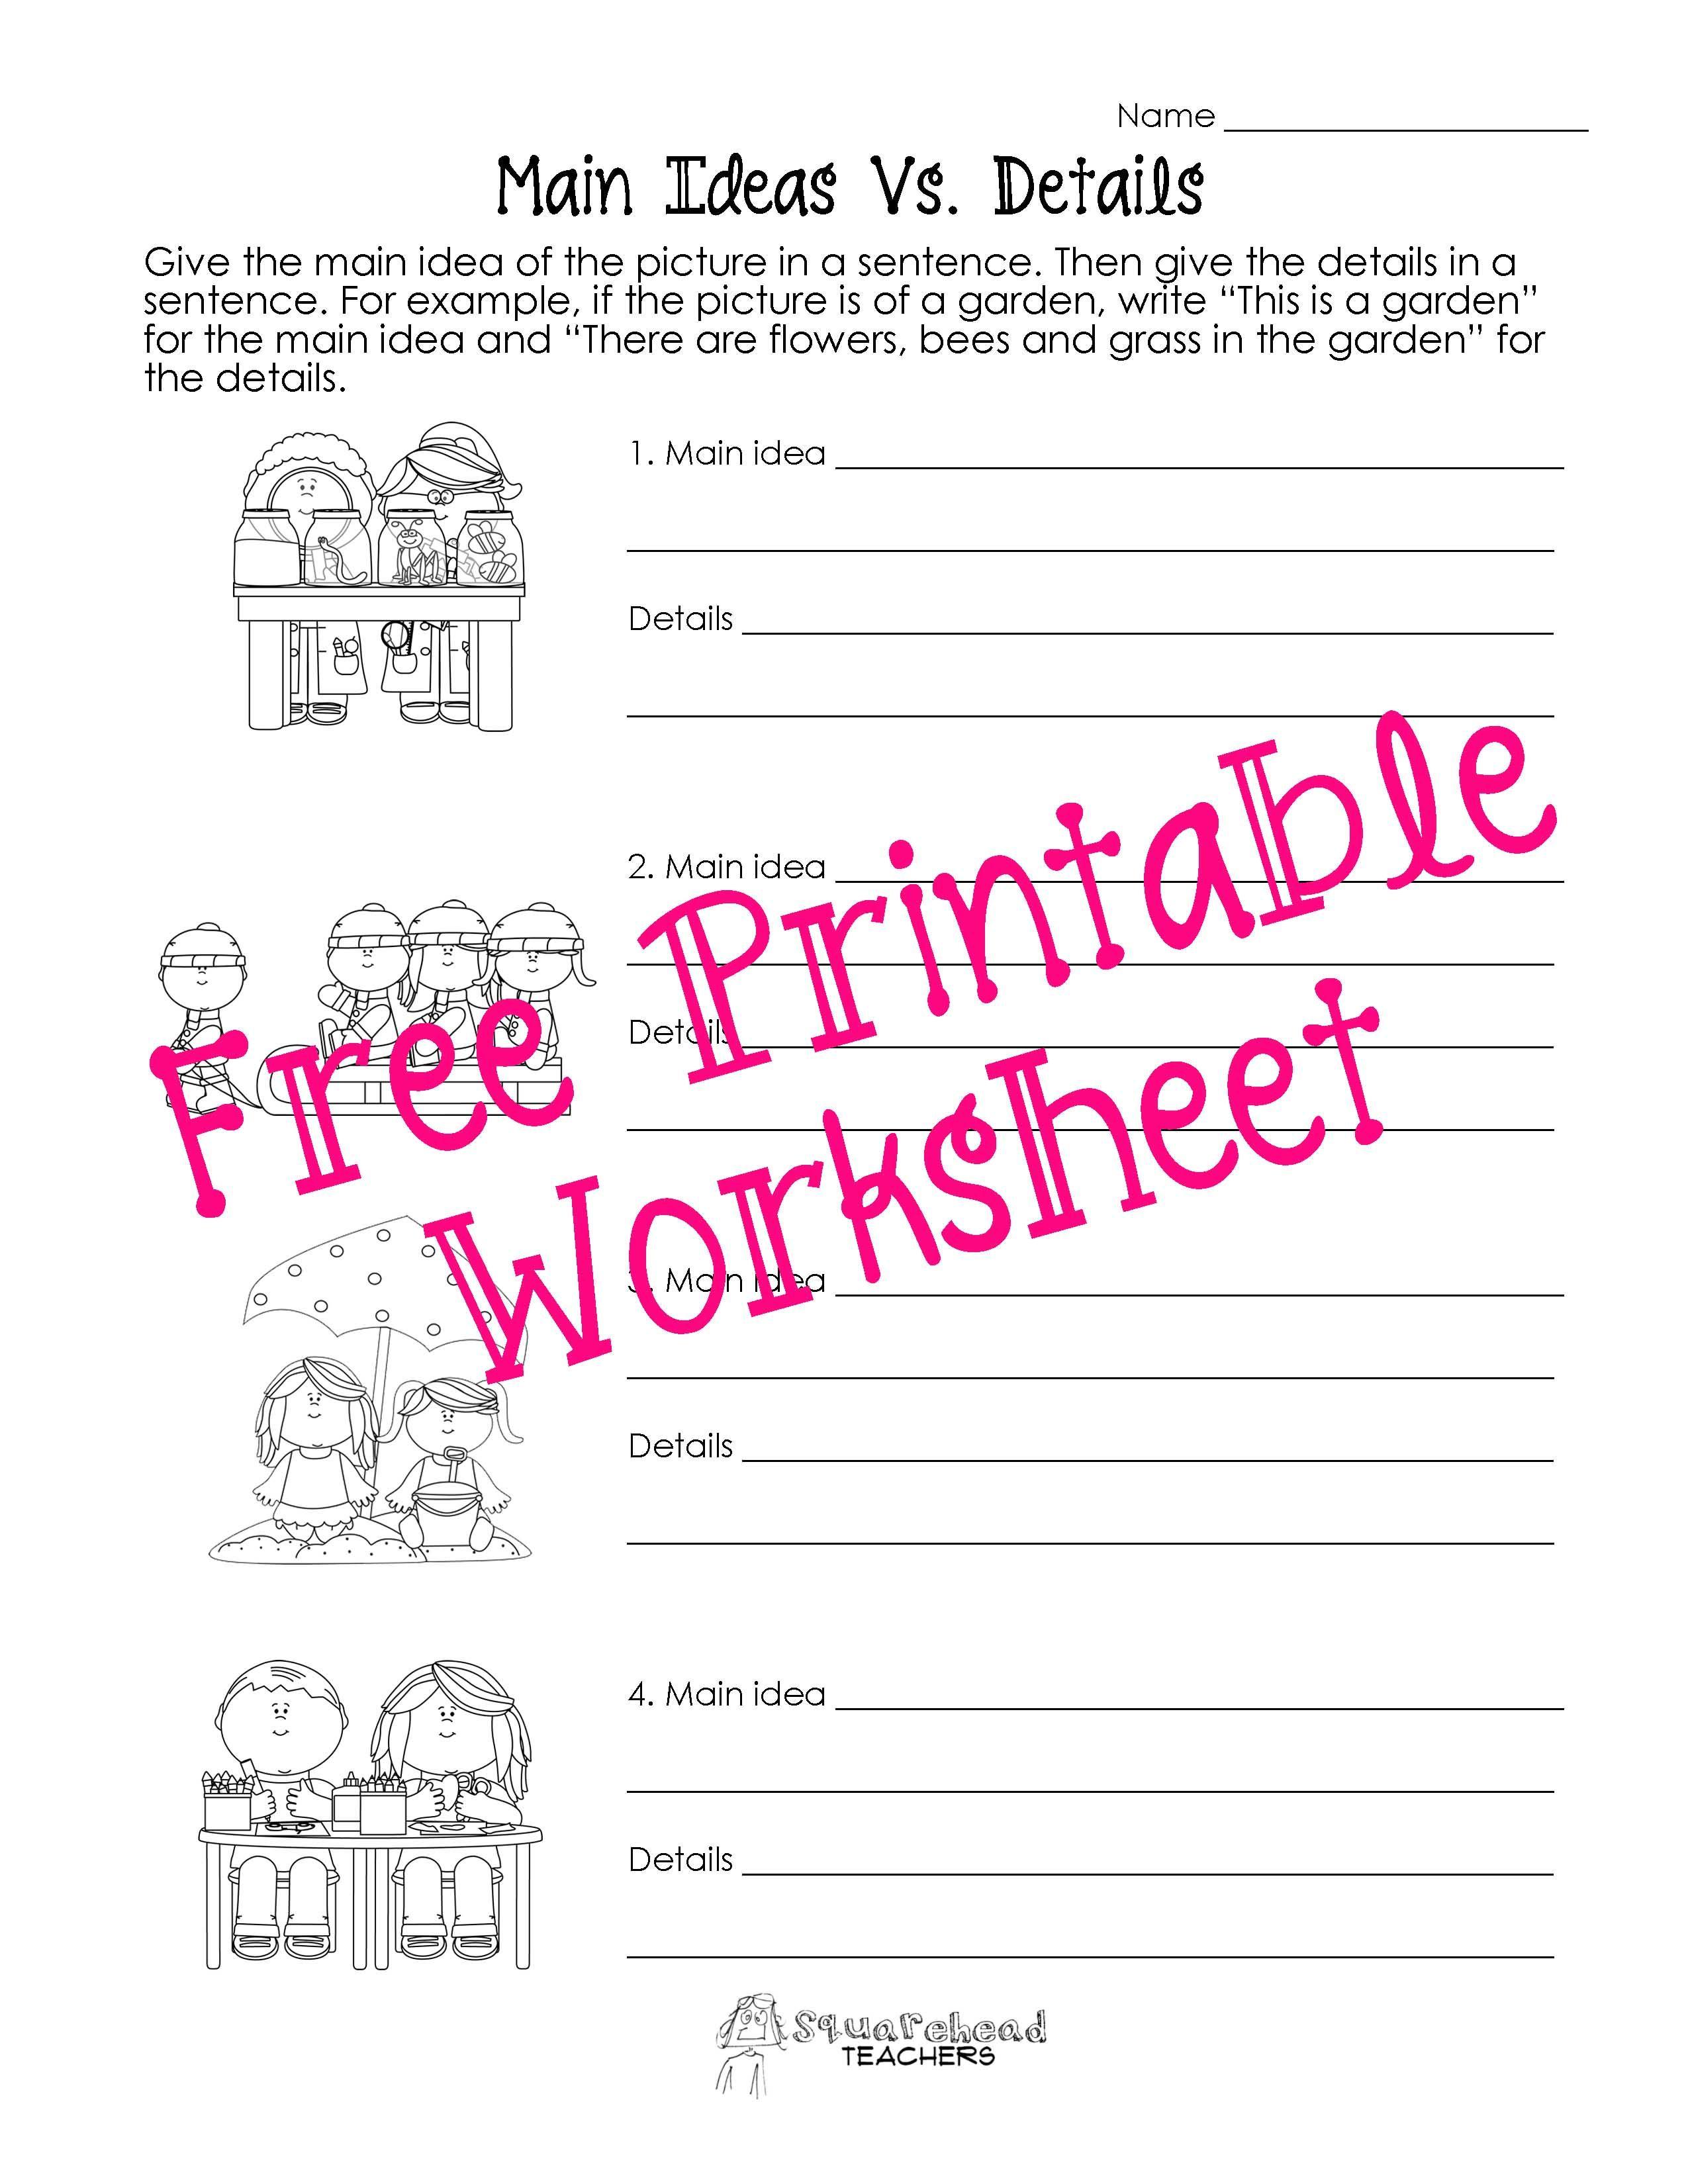 Free Printable Language Arts Worksheets For 6th Grade